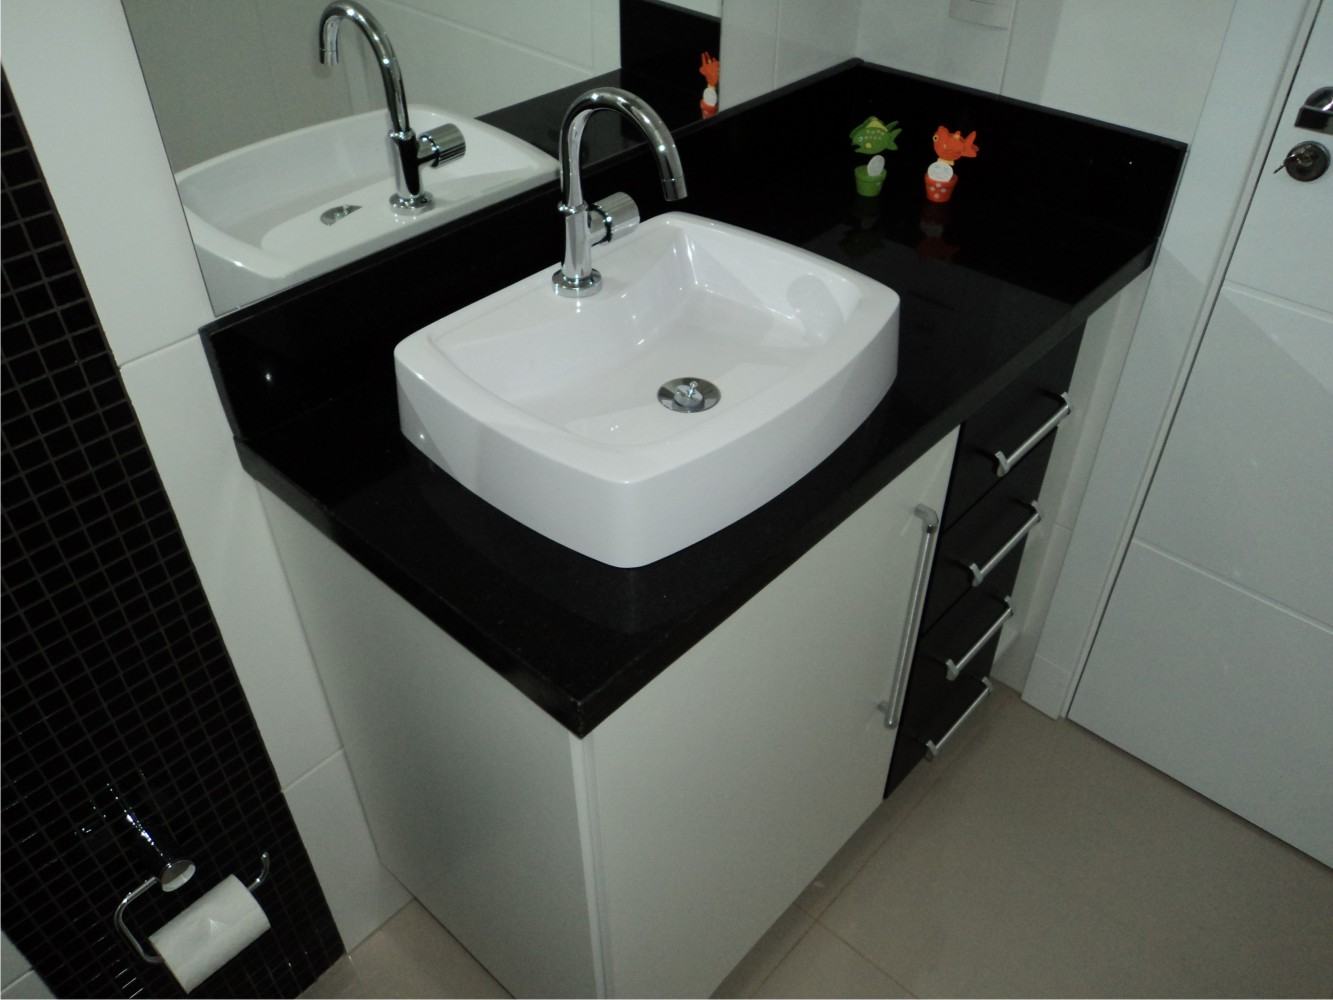 Banheiros Preto e Branco Decorados – Fotos Lindas – HD Wallpapers #634B3C 1333 1000